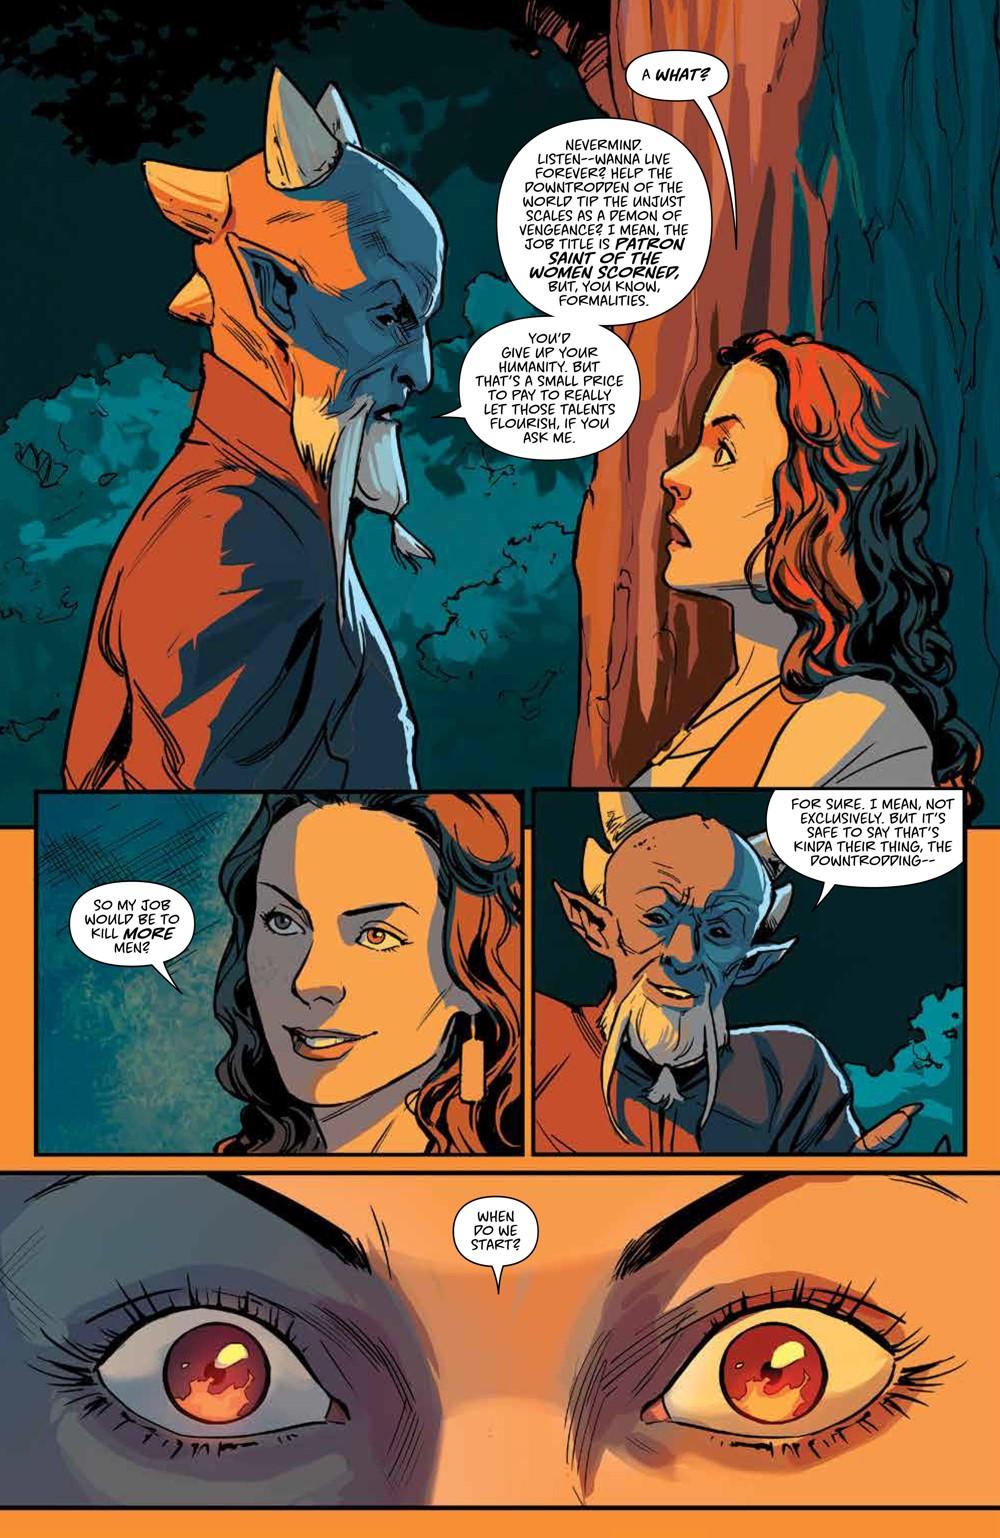 Buffy_v6_SC_PRESS_13 ComicList Previews: BUFFY THE VAMPIRE SLAYER VOLUME 6 SECRETS OF THE SLAYER TP